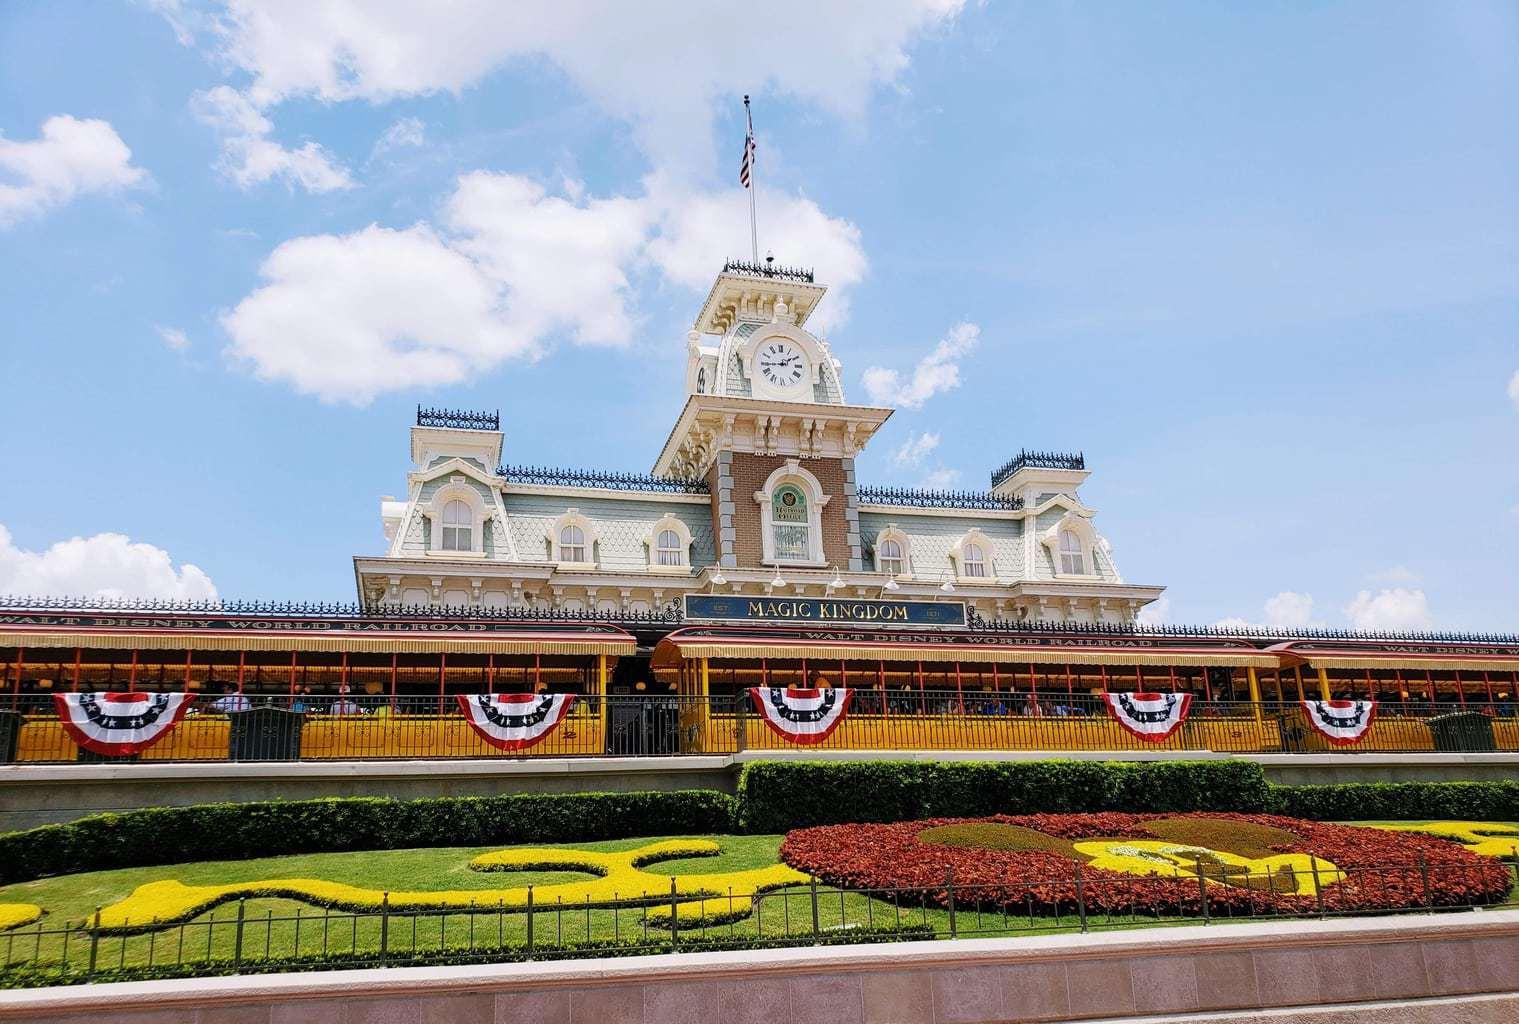 Disney Bloggers, Front Entrance of Magic Kingdom